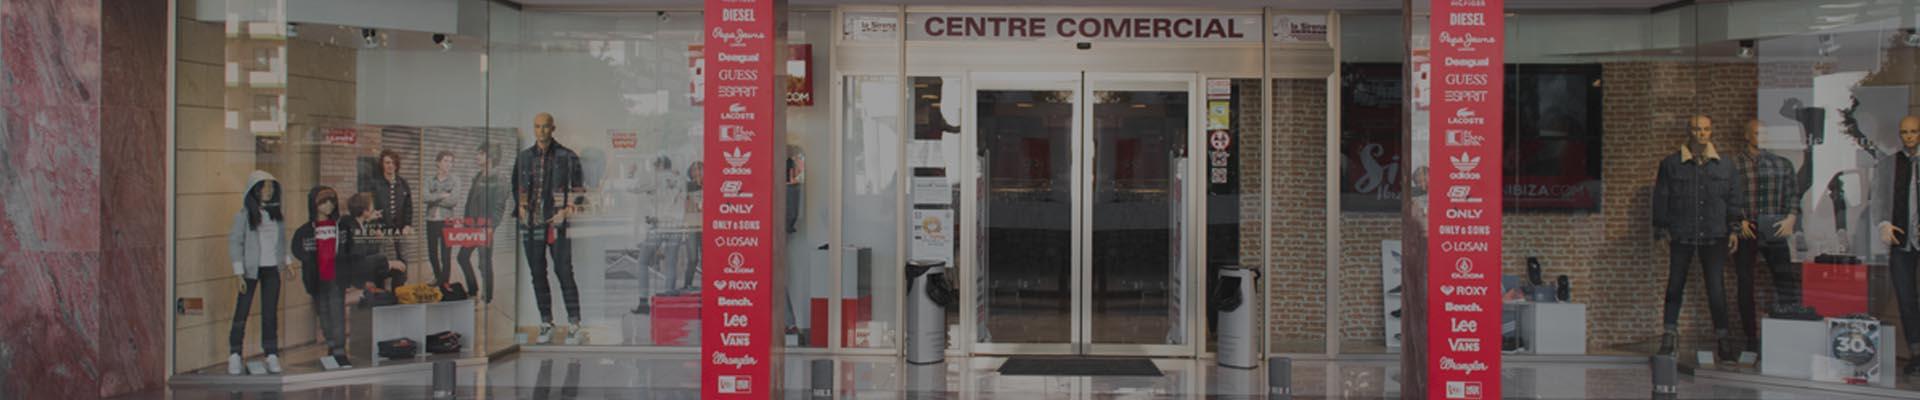 Centro Comercial la Sirena